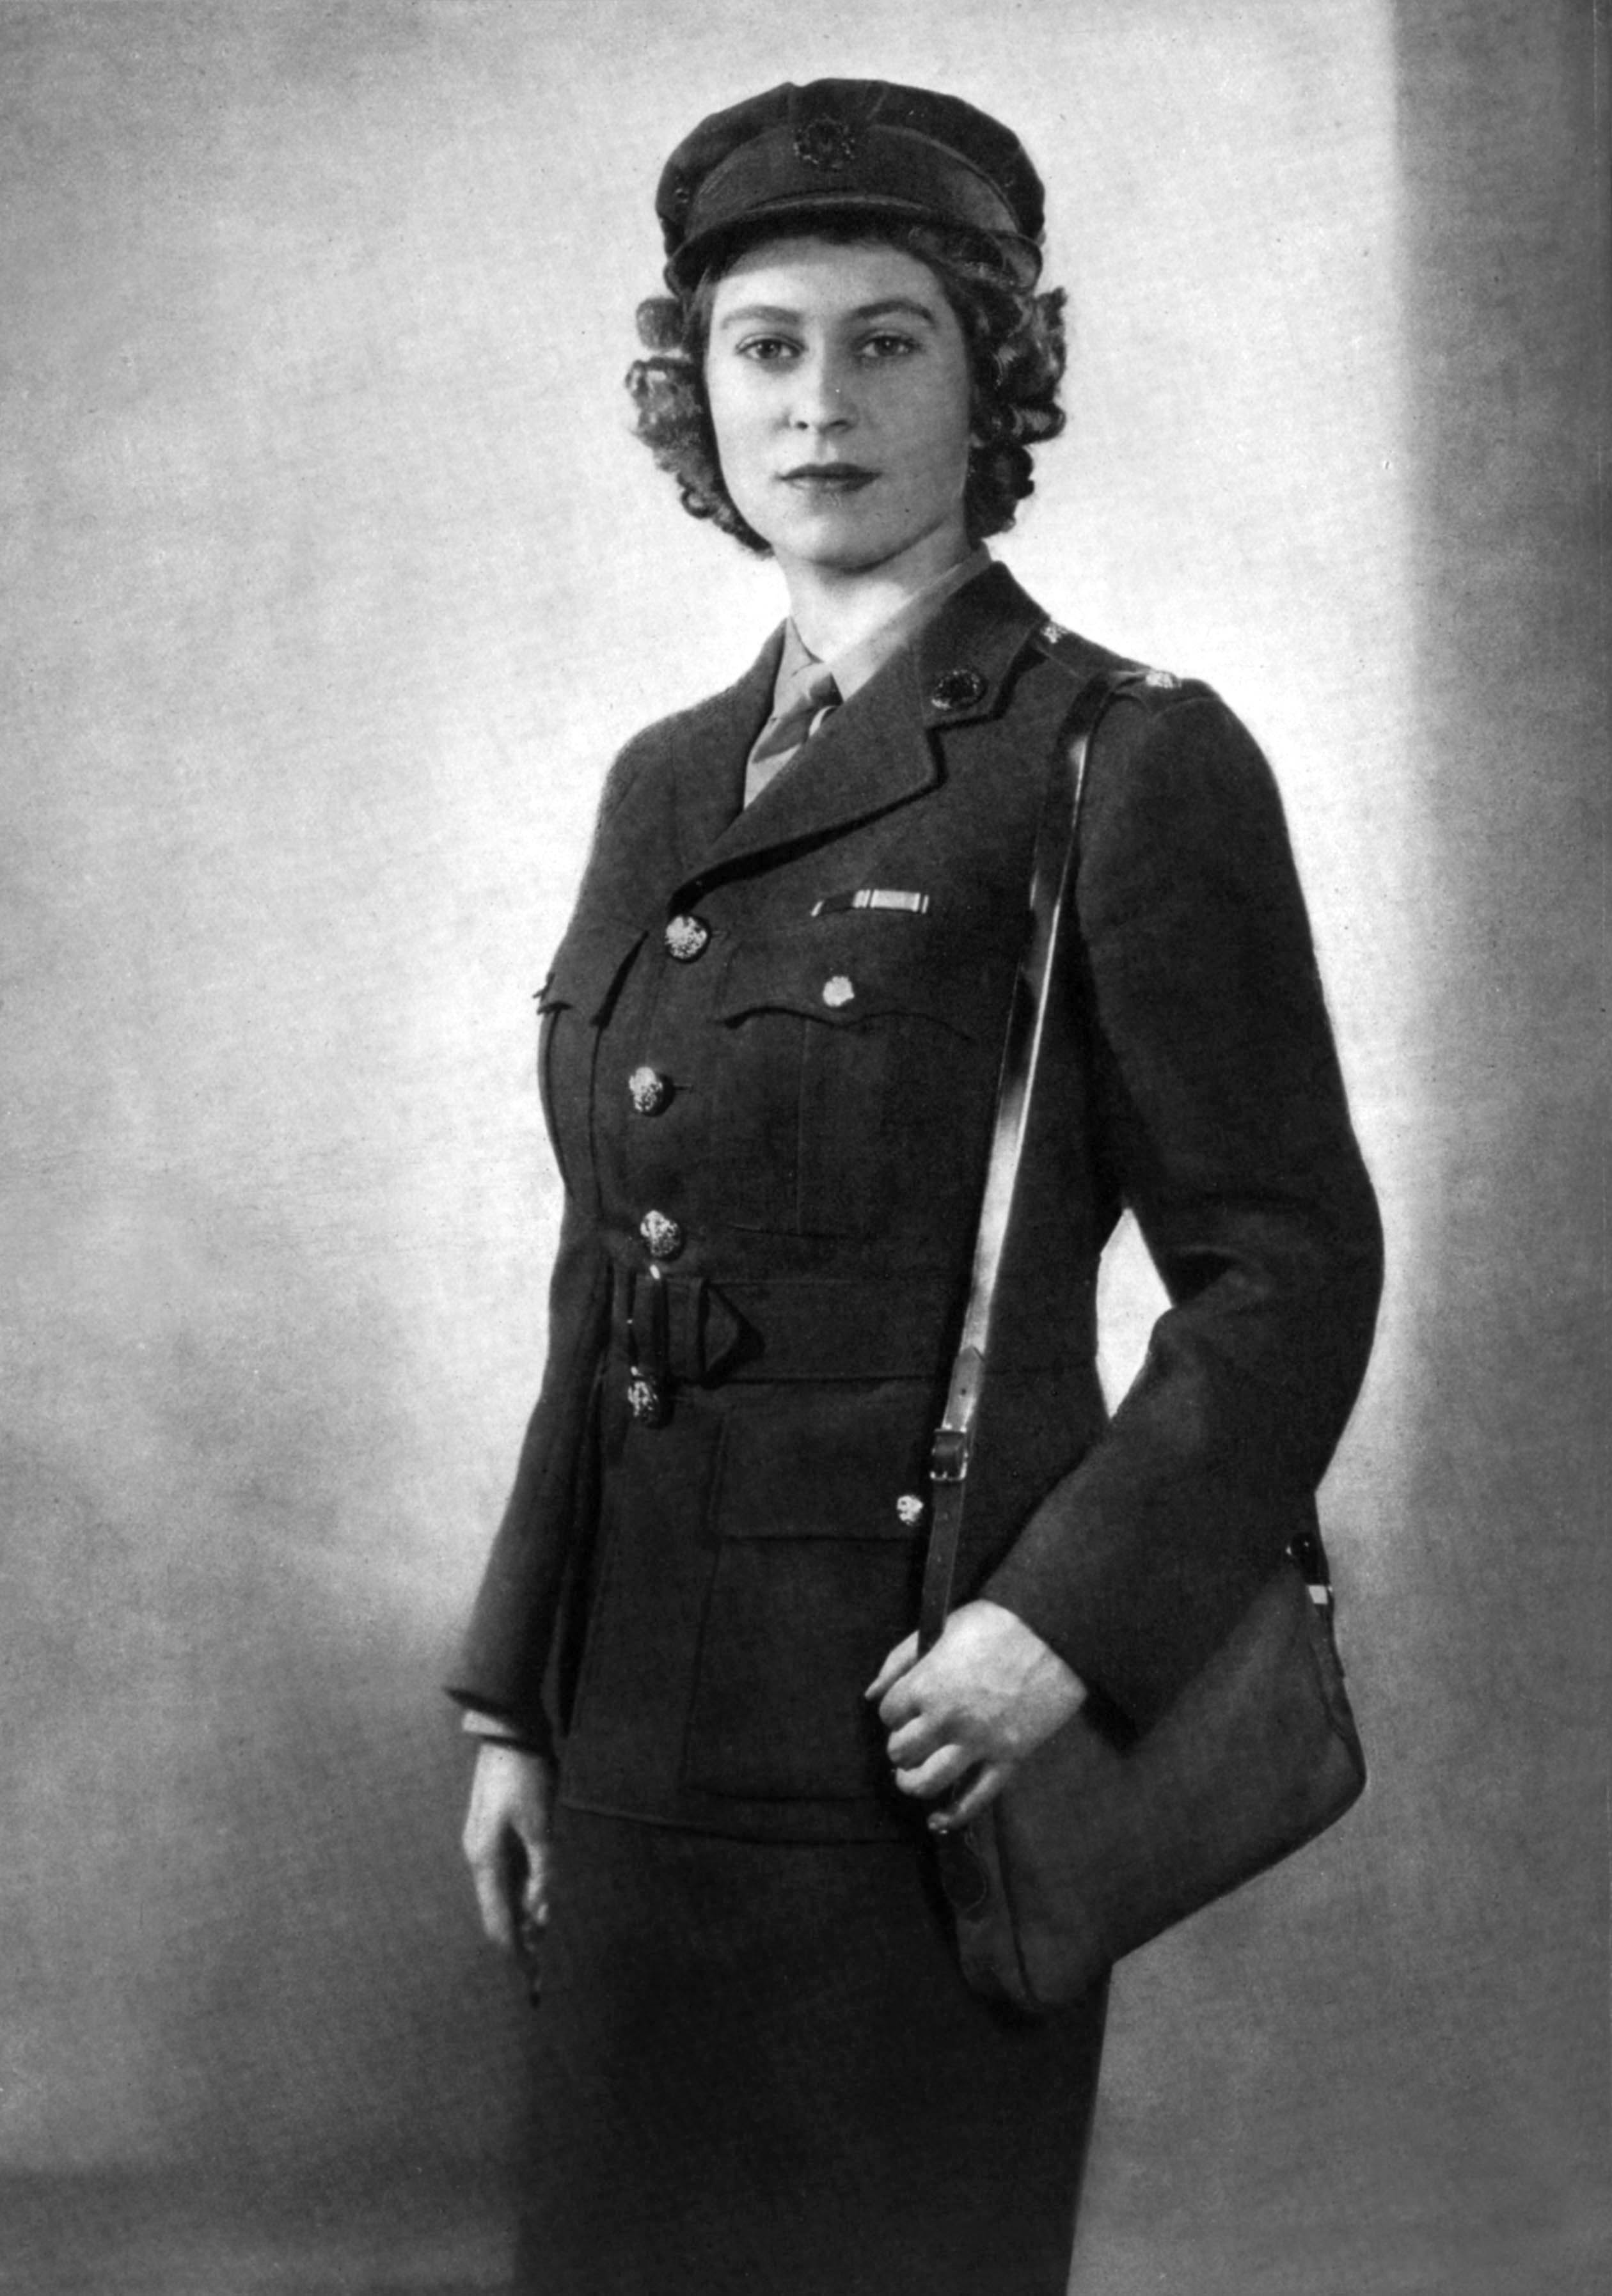 Princess Elizabeth Age 19 Getty Images